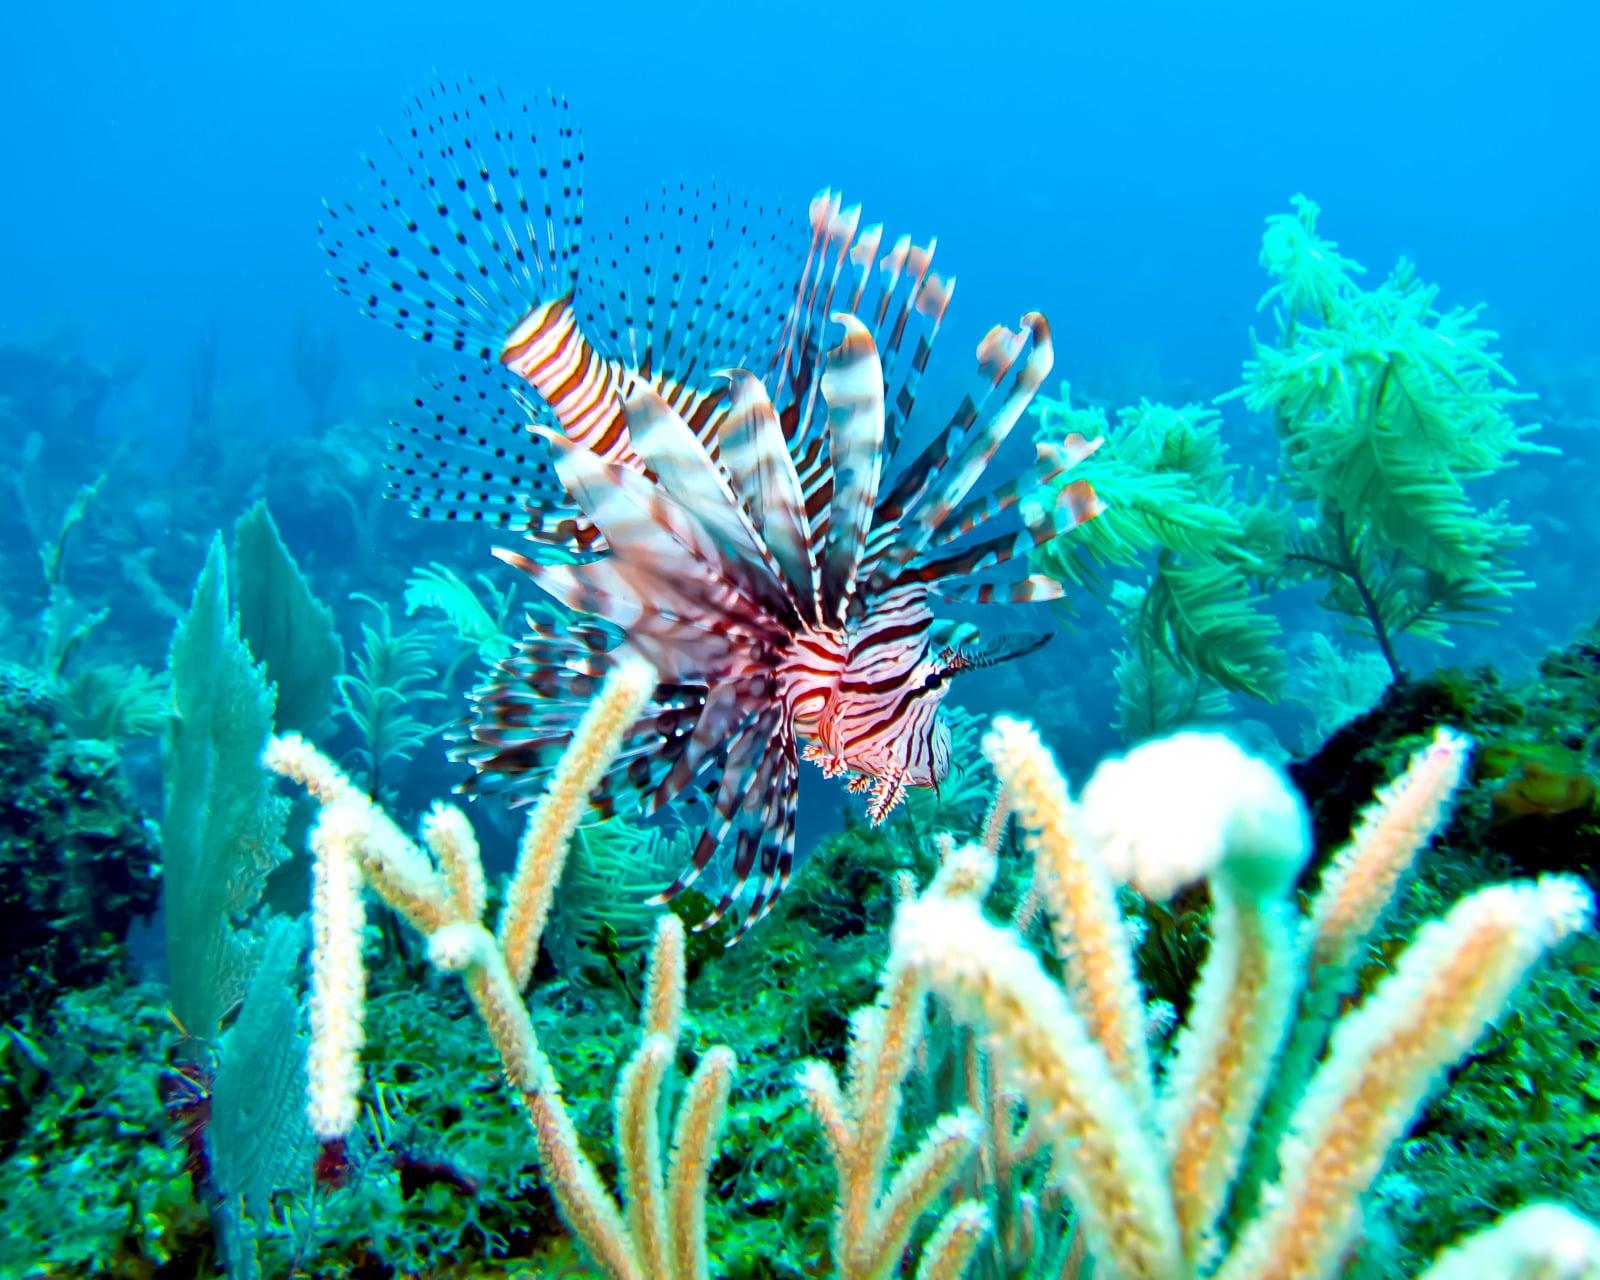 Lionfish Caye Chapel Caye Caulker Marine Reserve Belize